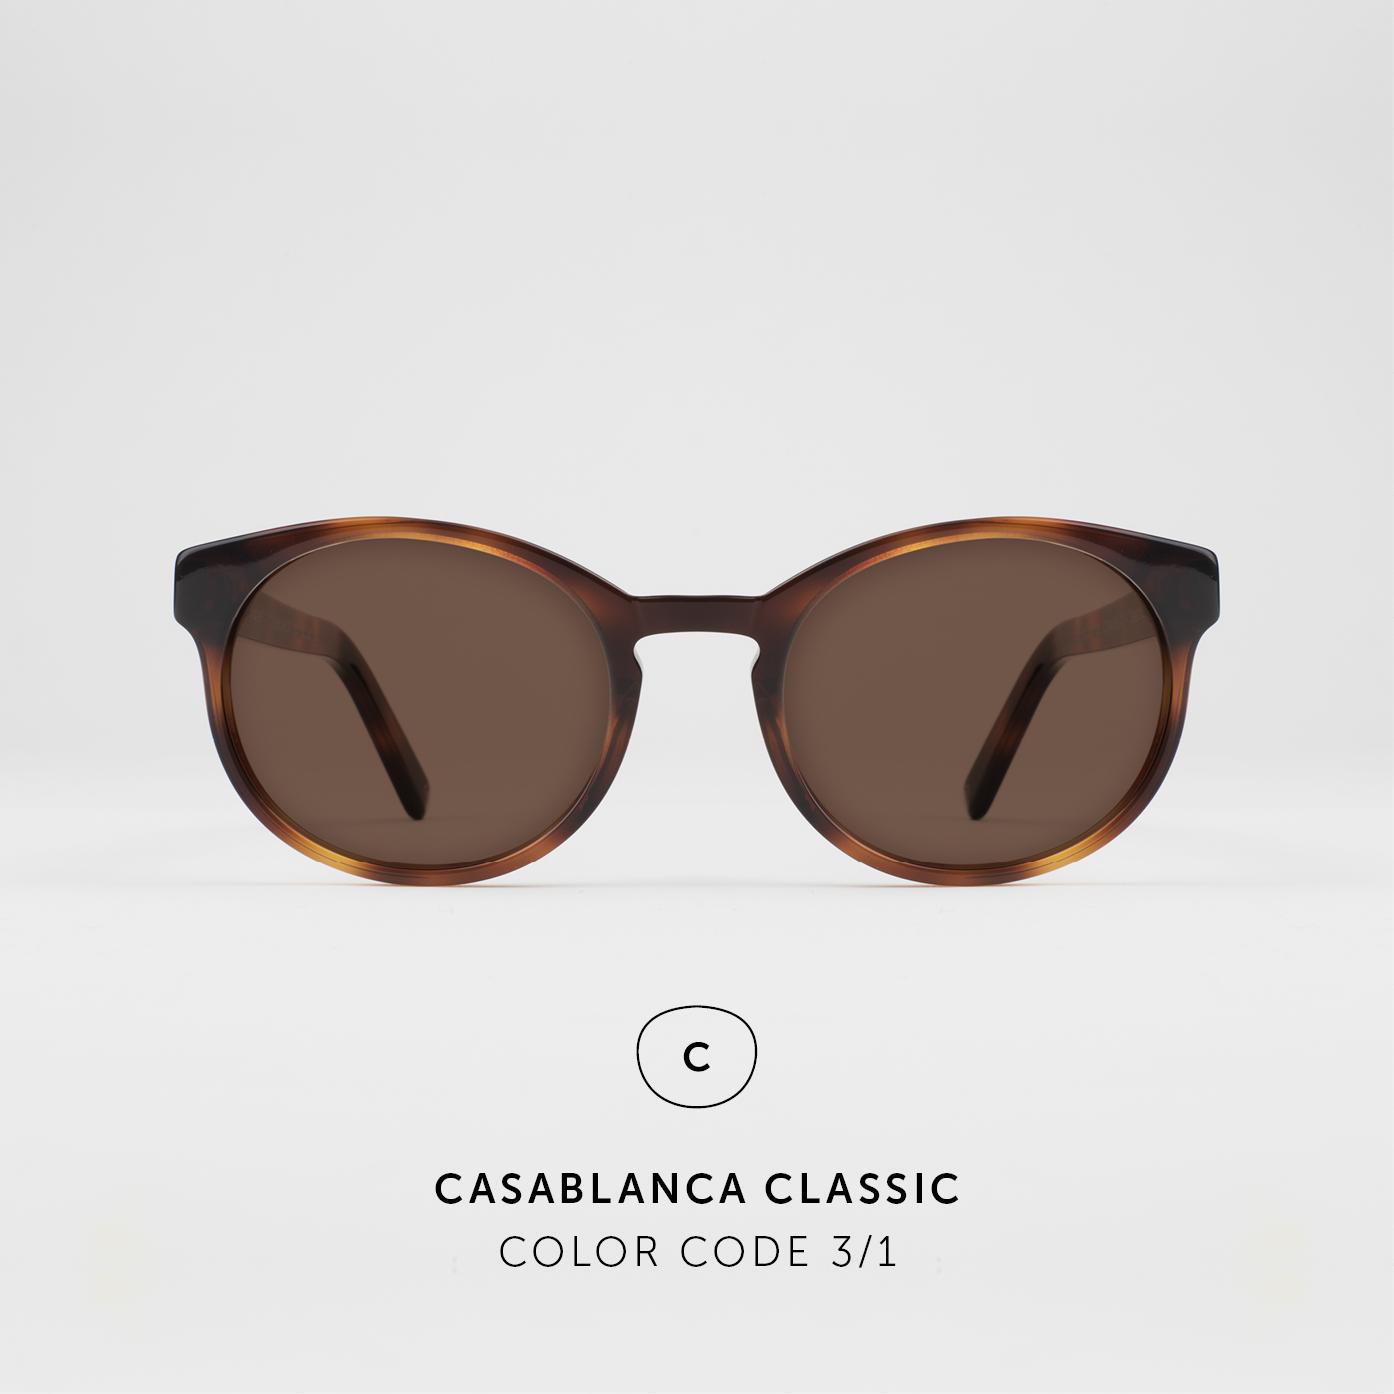 CasablancaClassic22.jpg